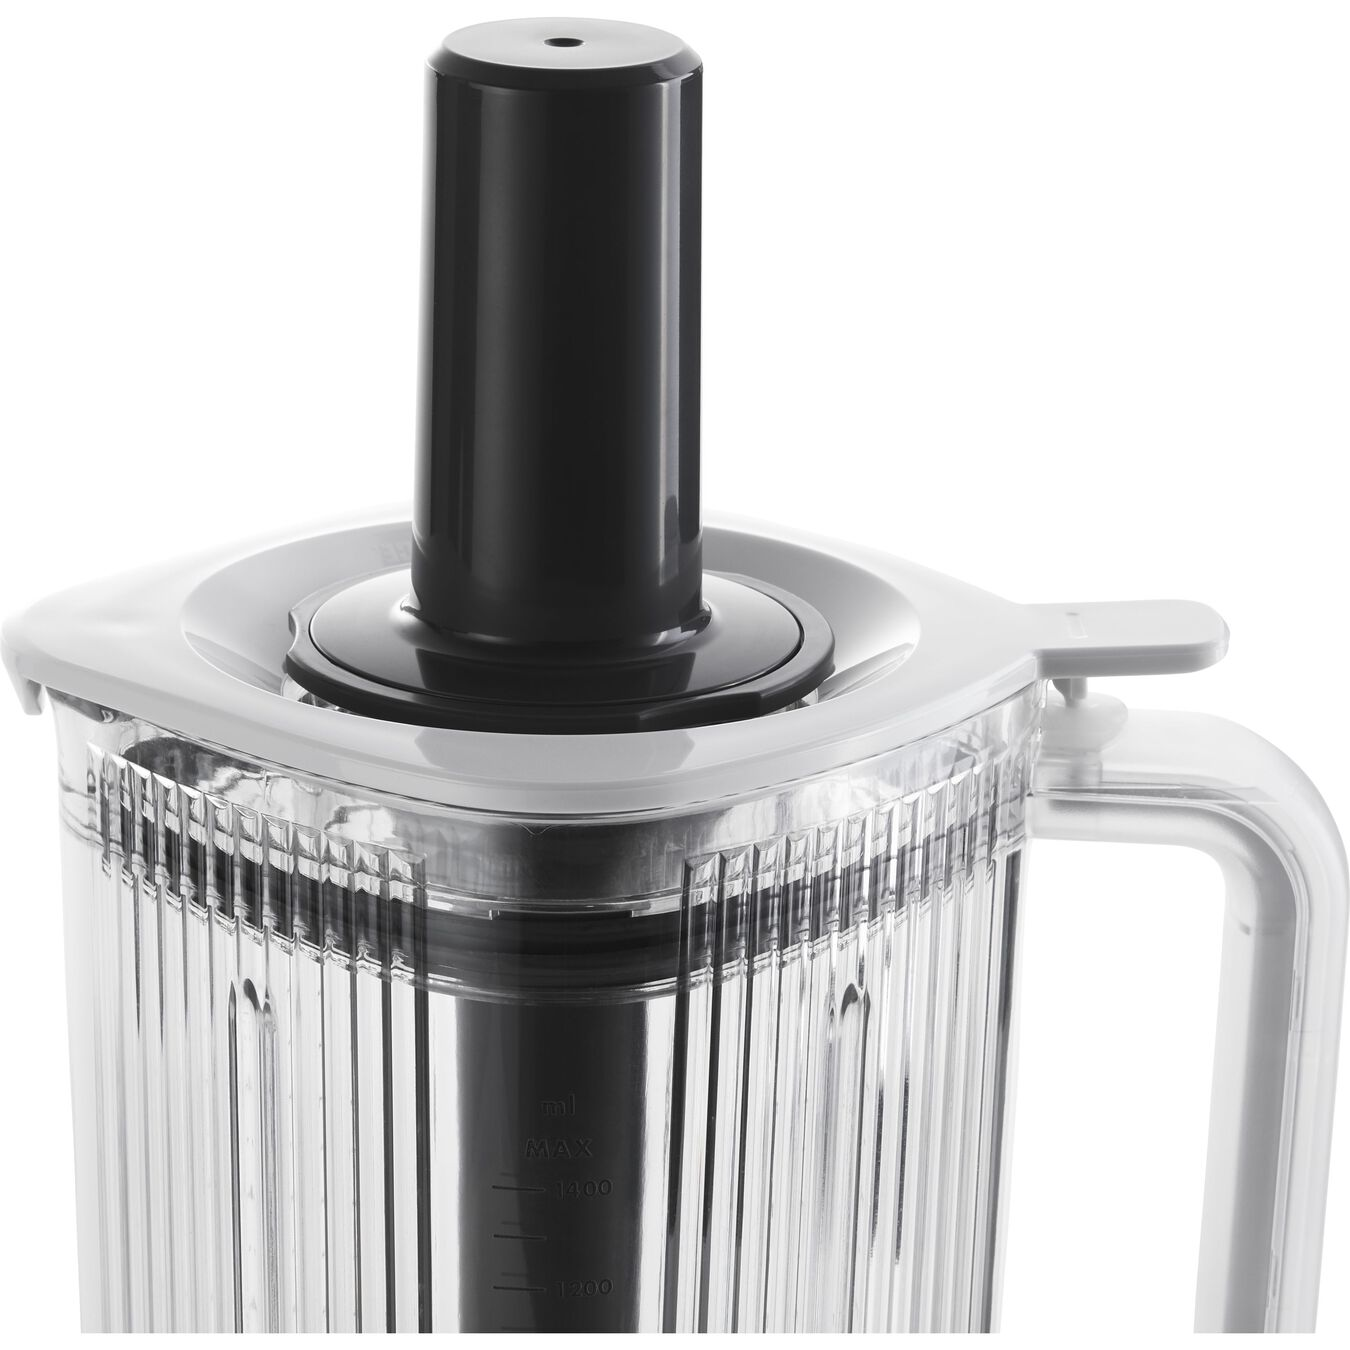 Table blender - silver,,large 5